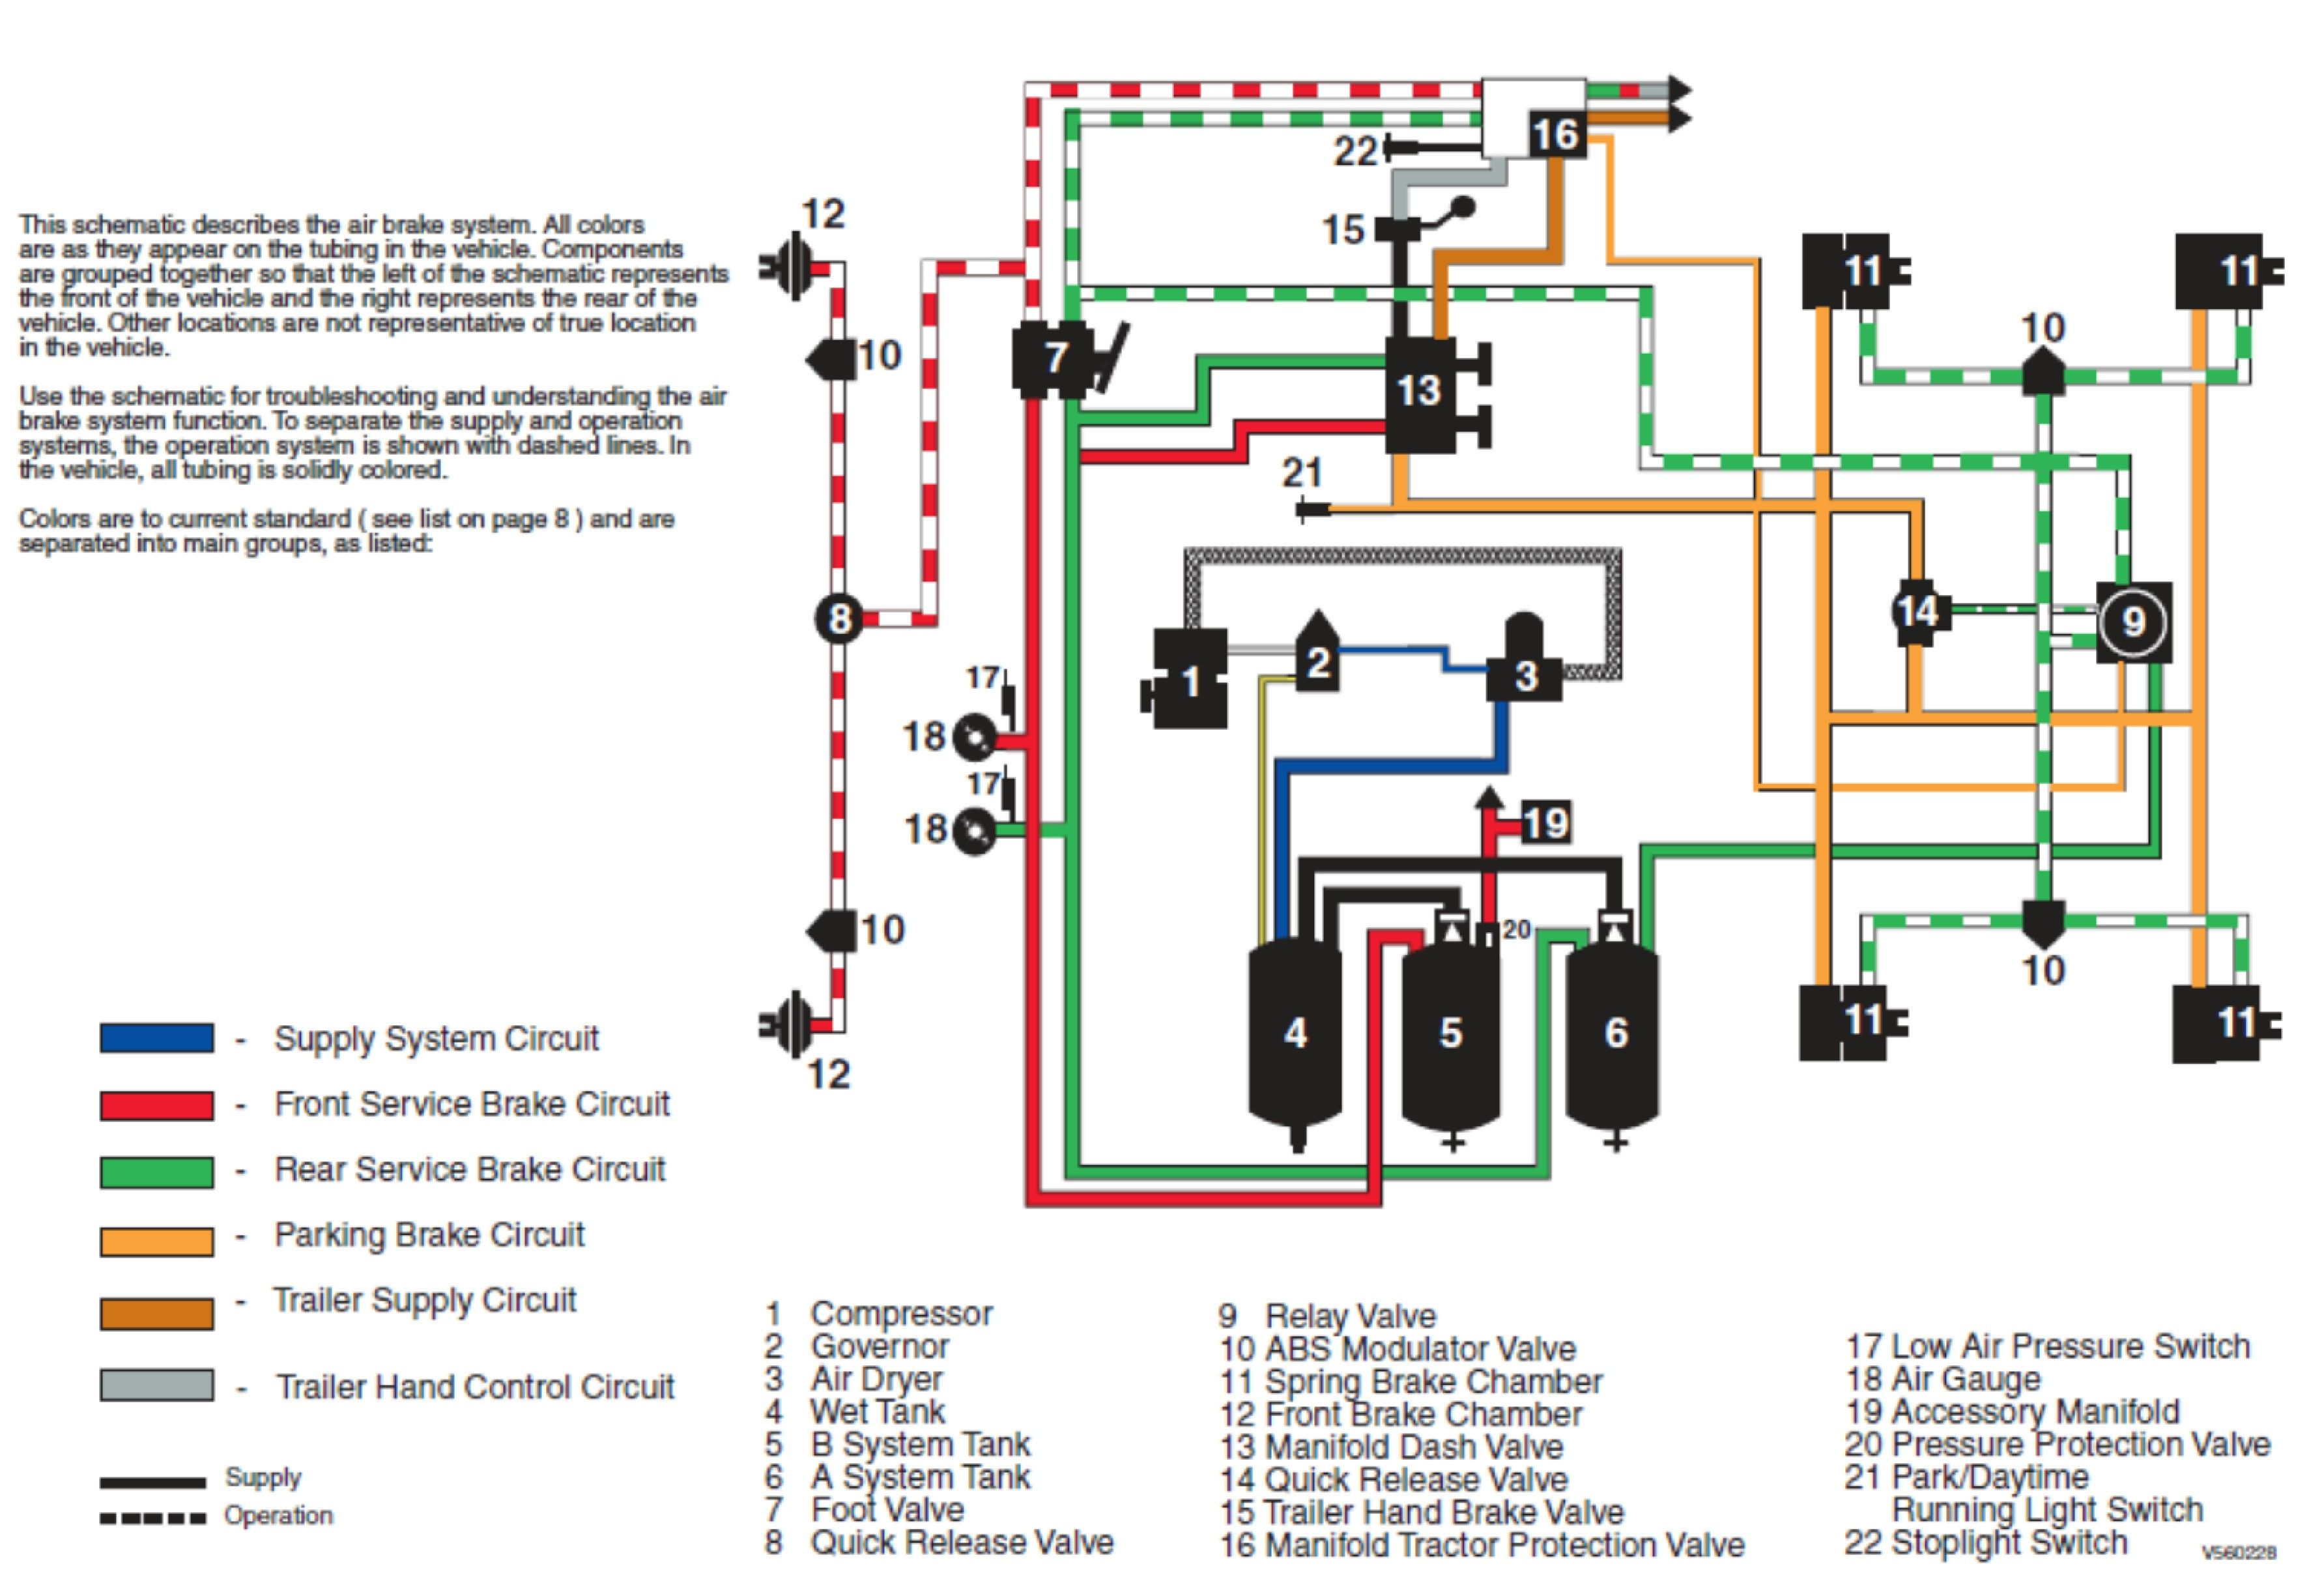 Featherlite Car Trailer Wiring Diagram Network Cat5 Tractor-trailer Air Brake System | Pinterest Brake, ...